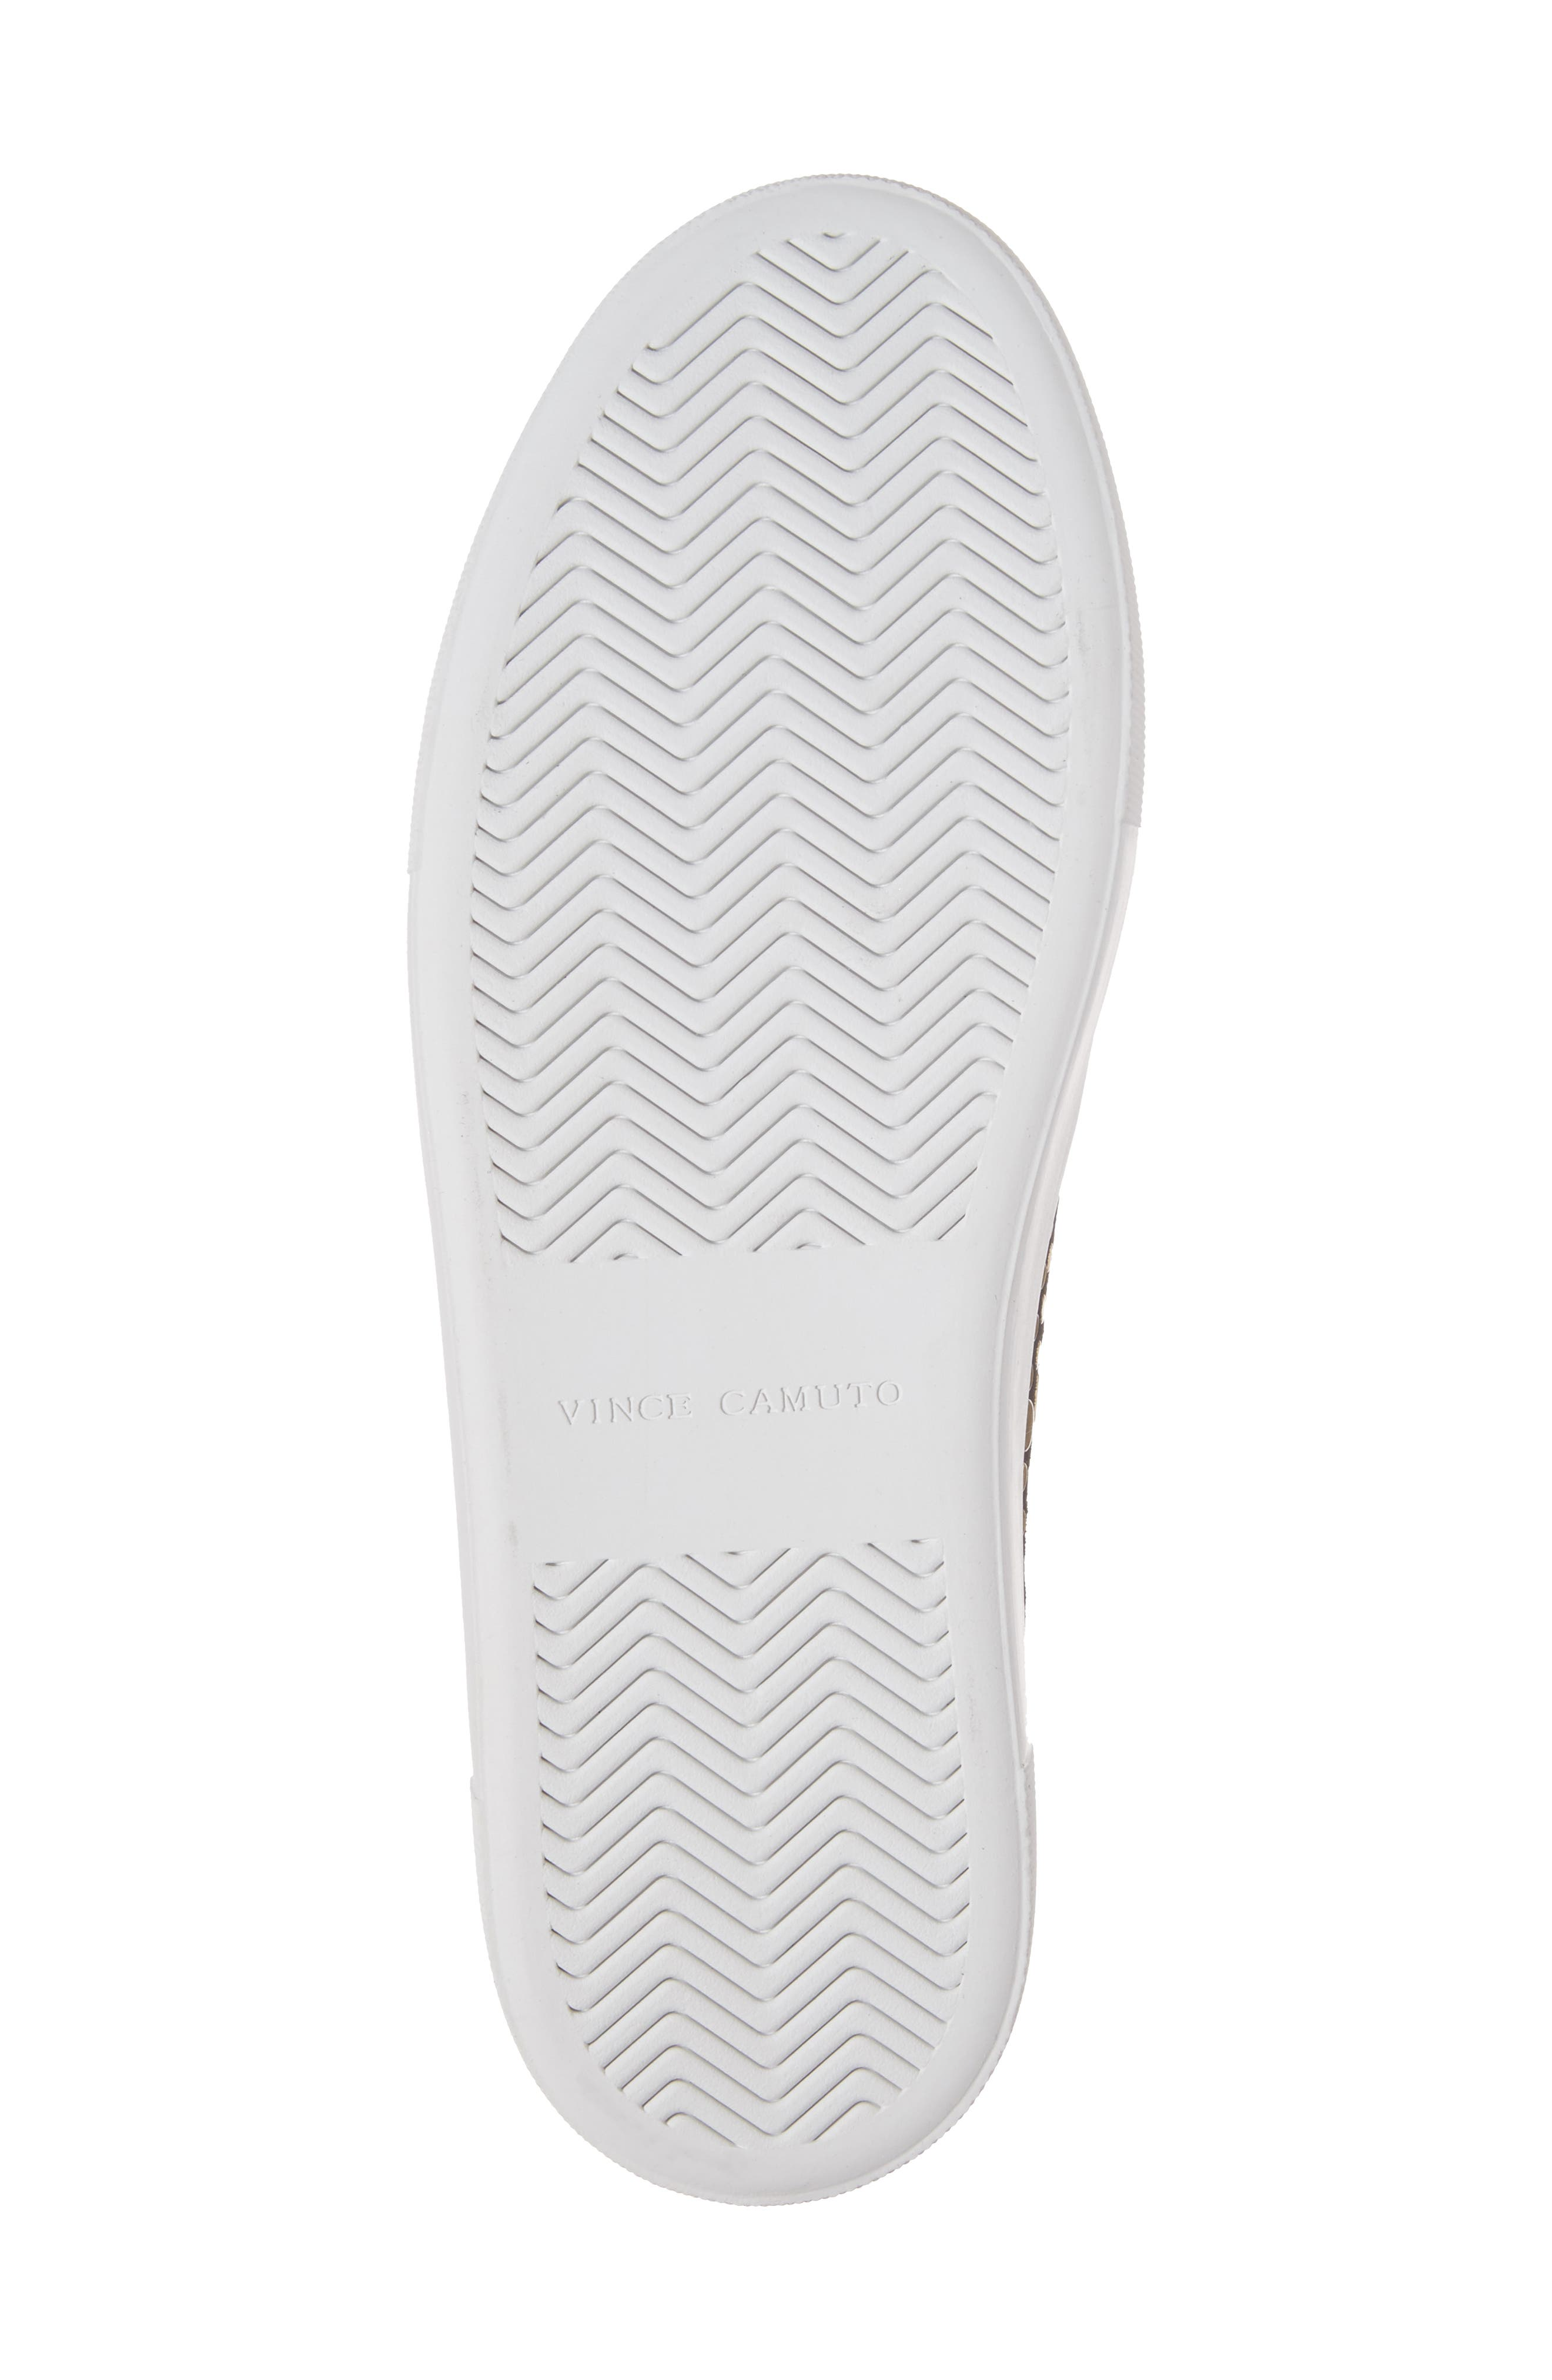 Kindra Stud Slip-On Sneaker,                             Alternate thumbnail 6, color,                             002